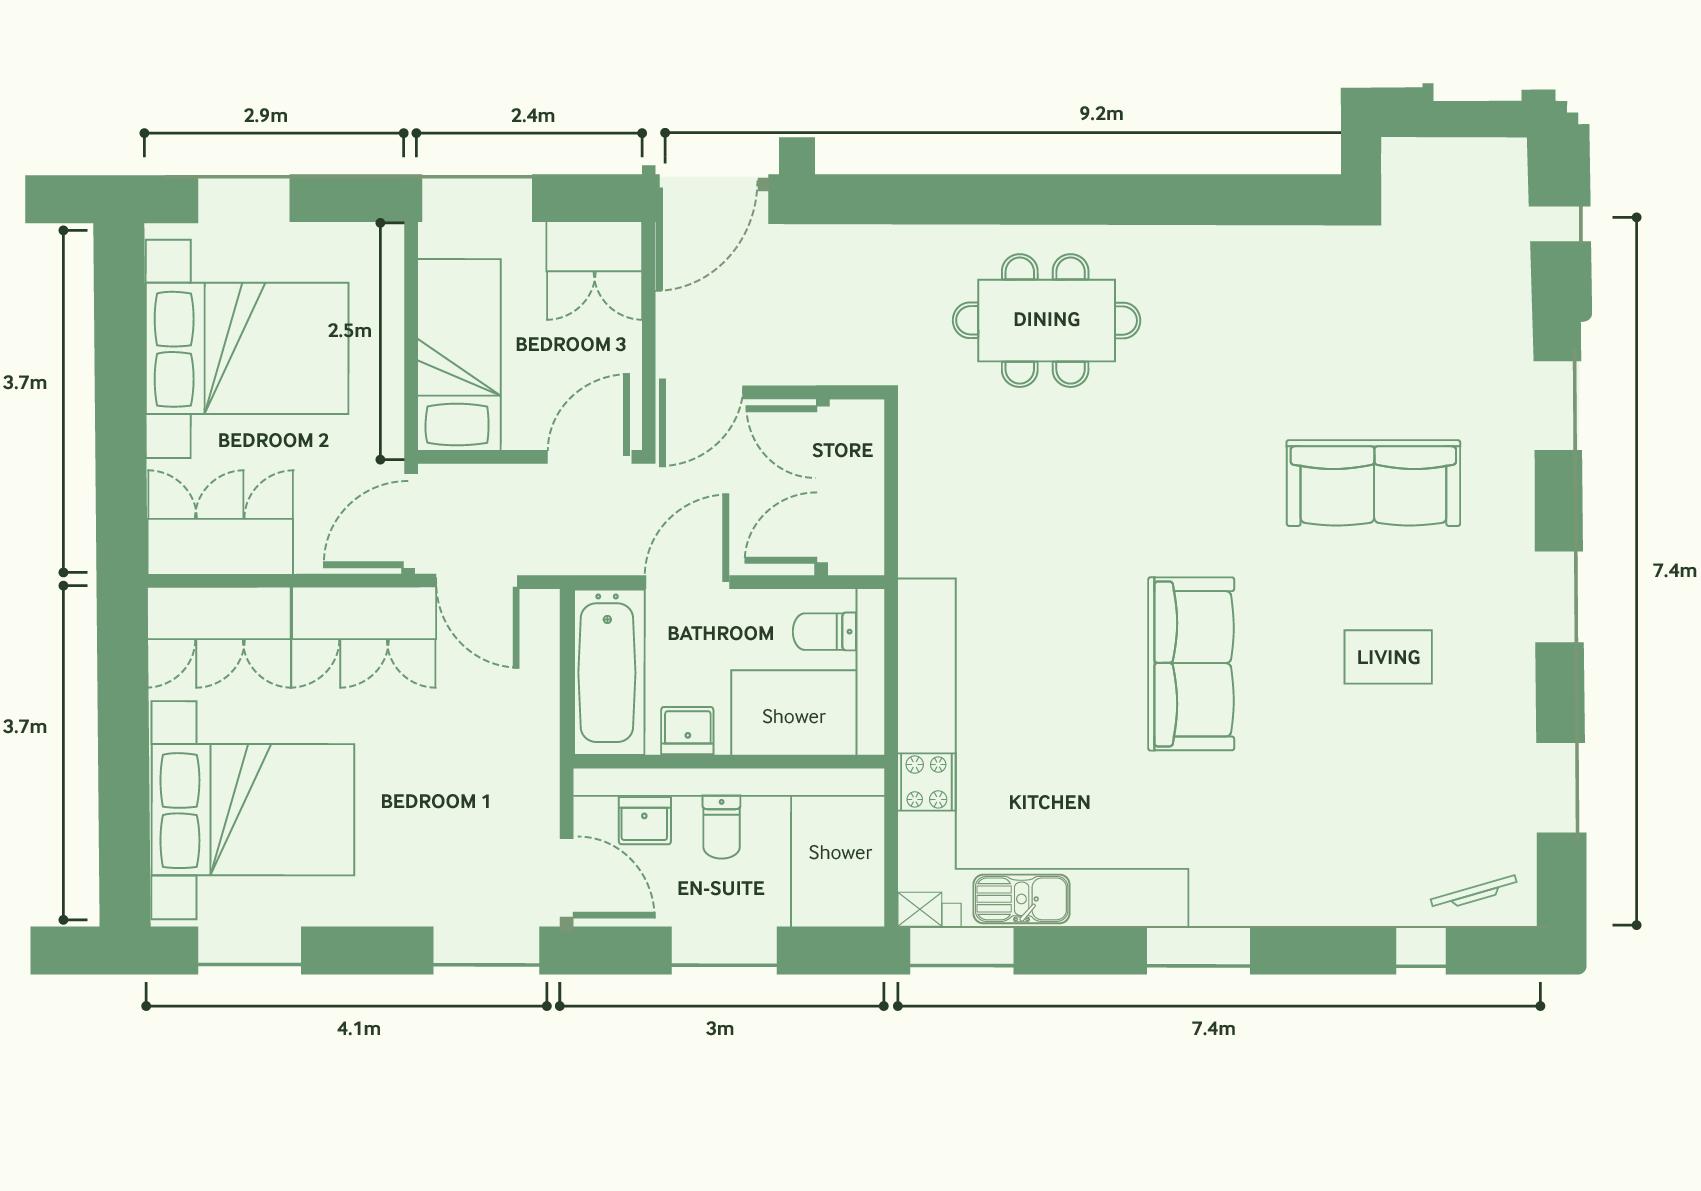 _Mundella-sfw-floorplan-export-apt-2.png